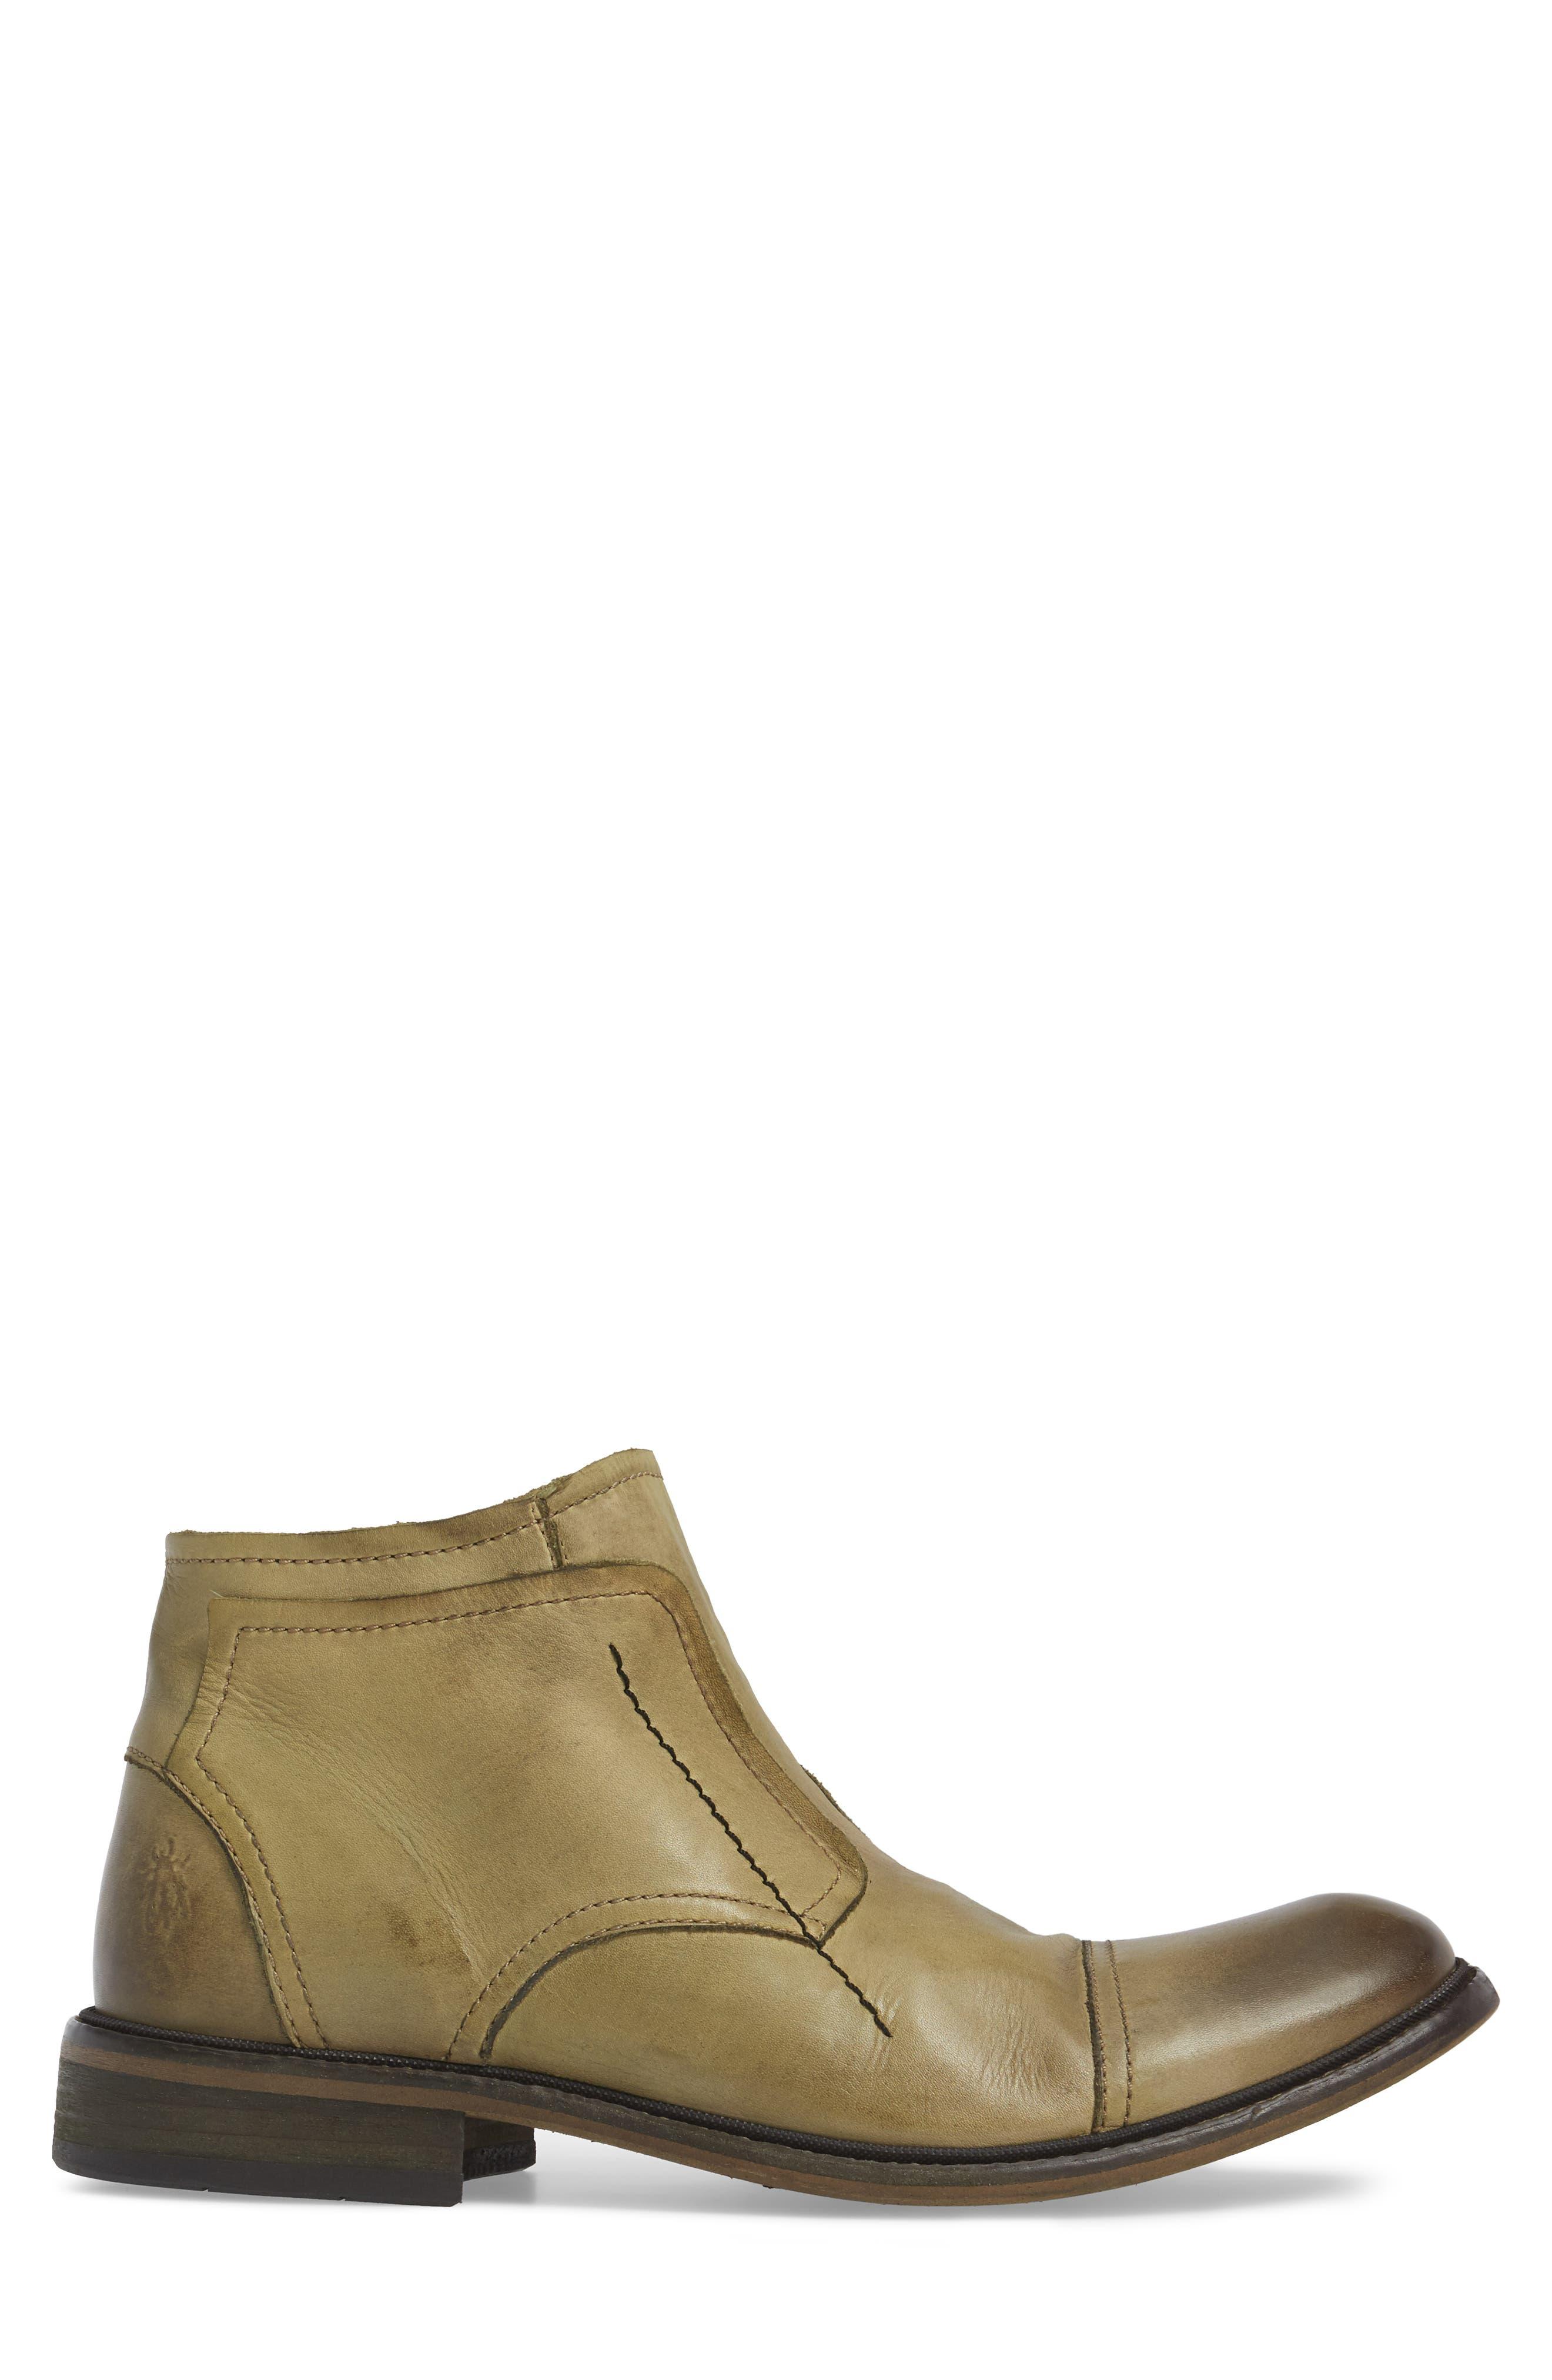 Hale Low Cap Toe Boot,                             Alternate thumbnail 3, color,                             Salvia